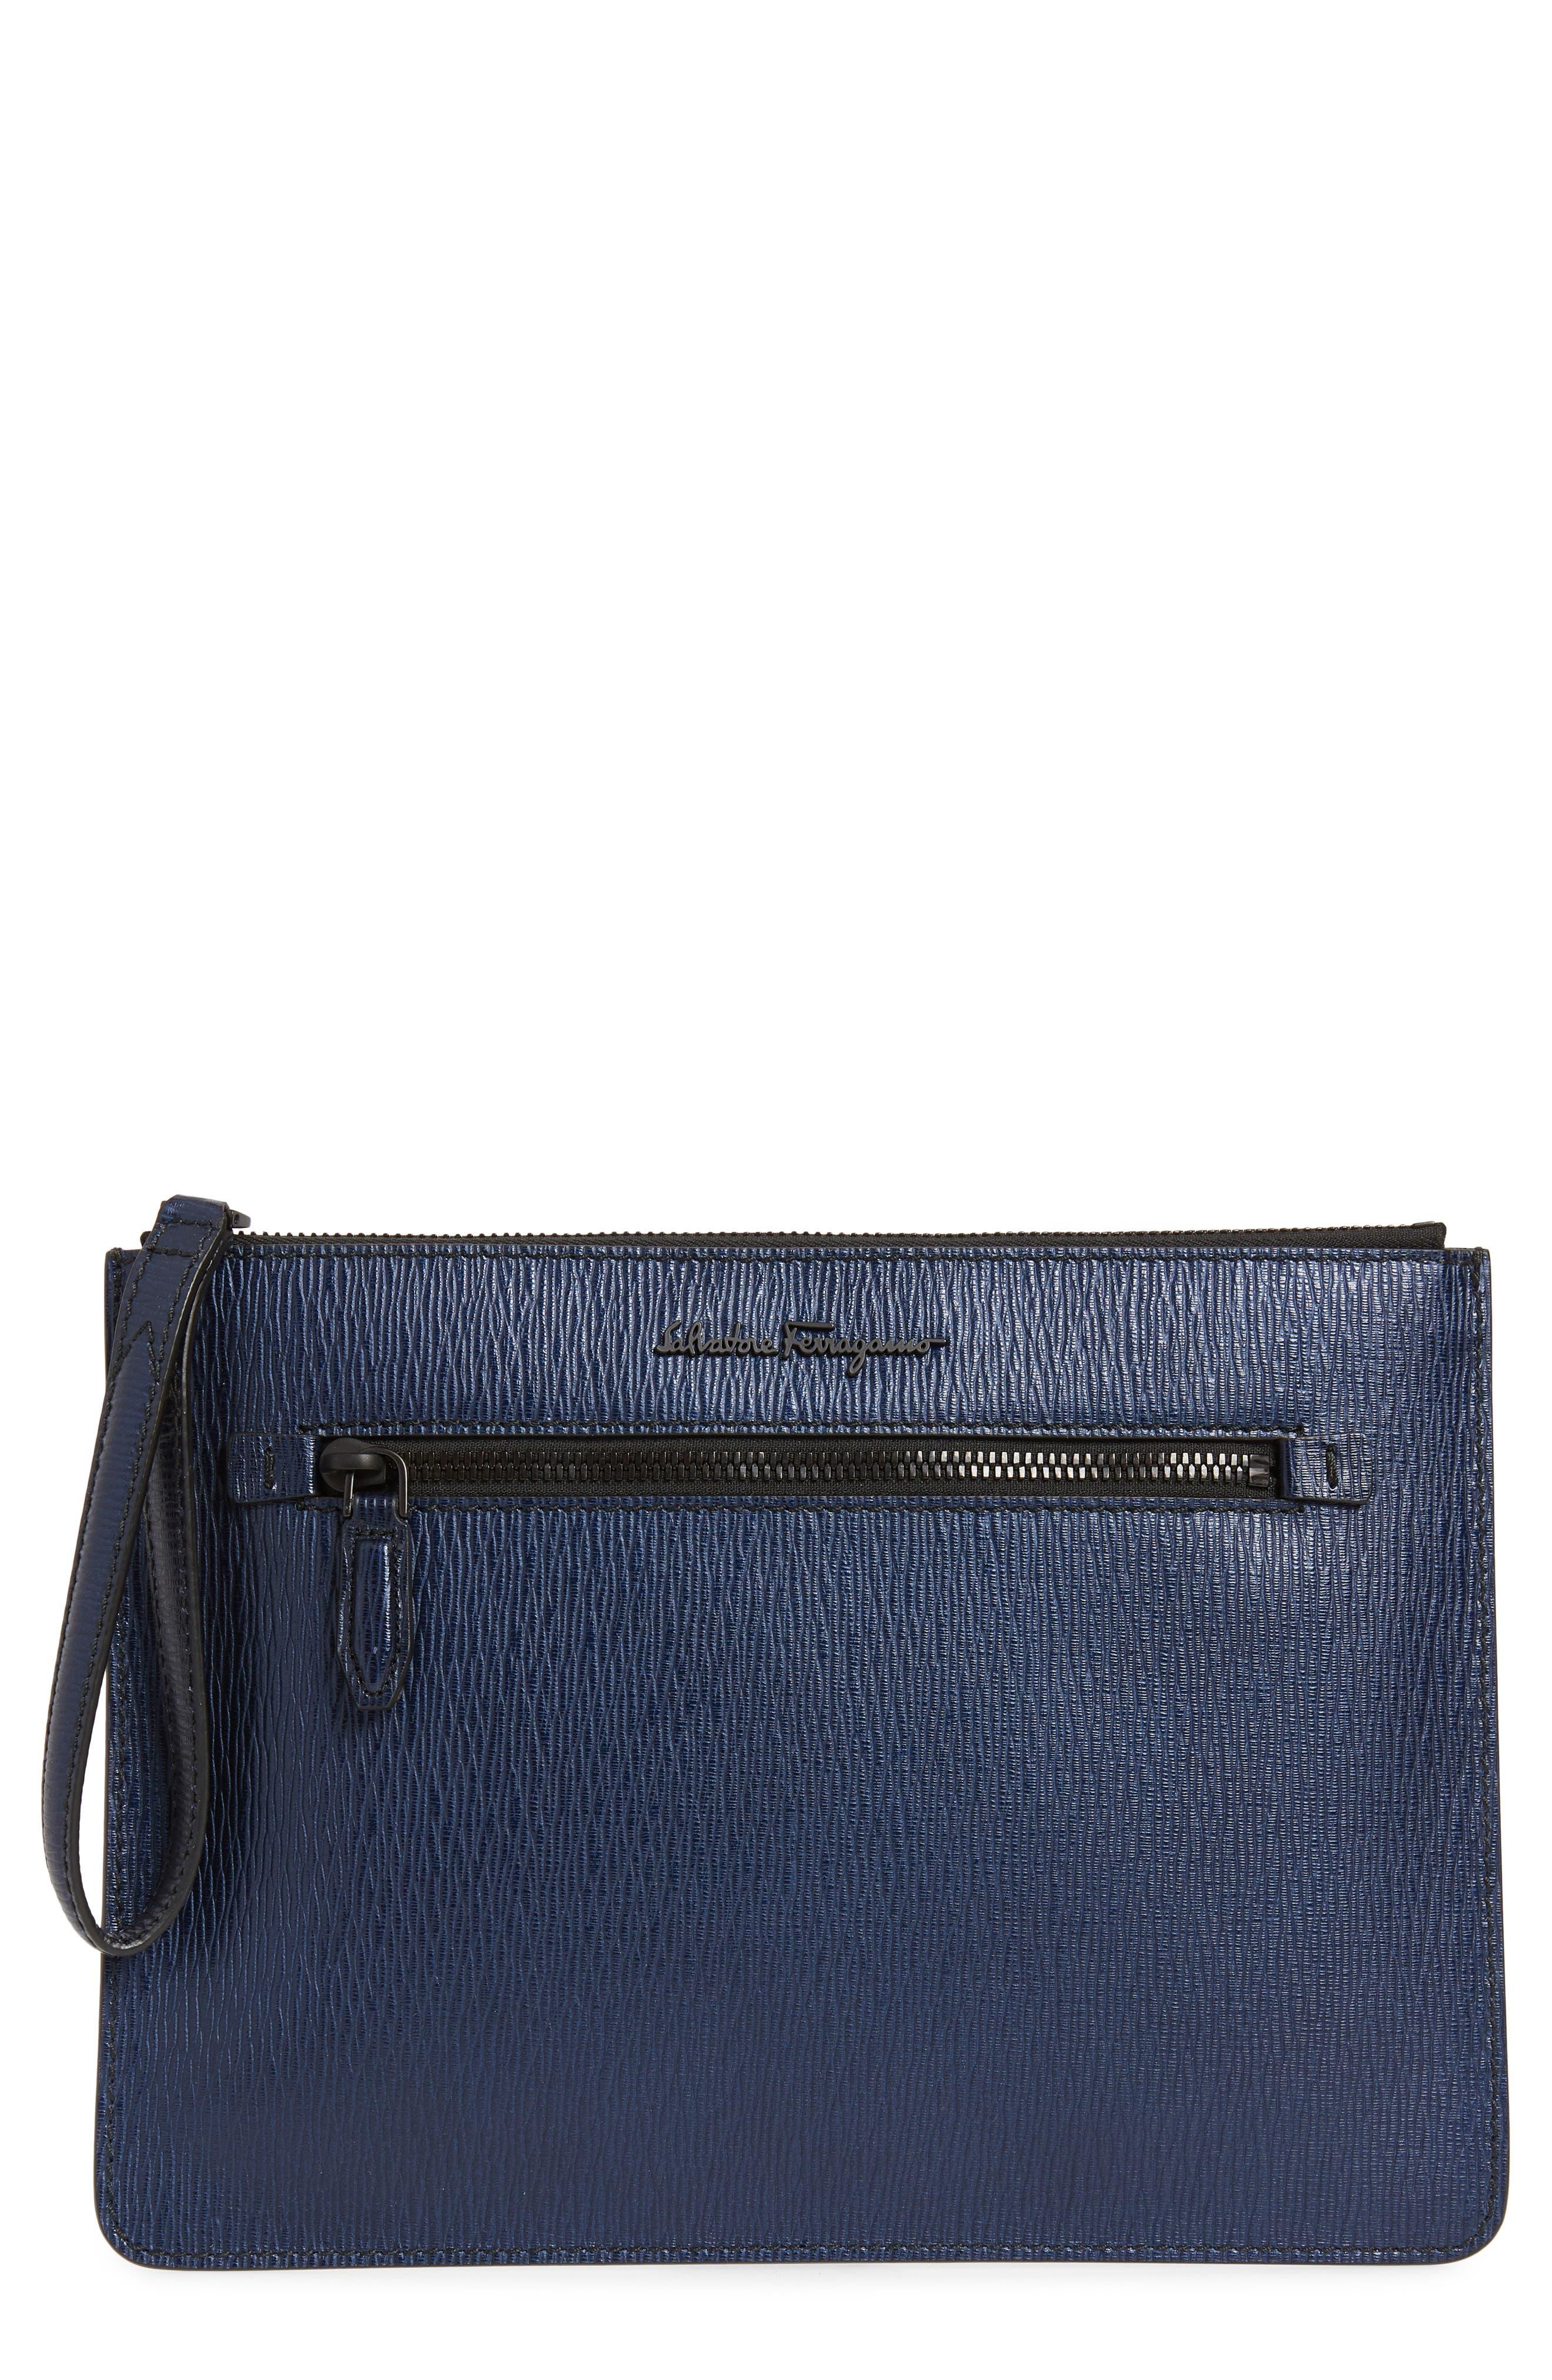 SALVATORE FERRAGAMO Textured Leather Zip Pouch, Main, color, NAVY